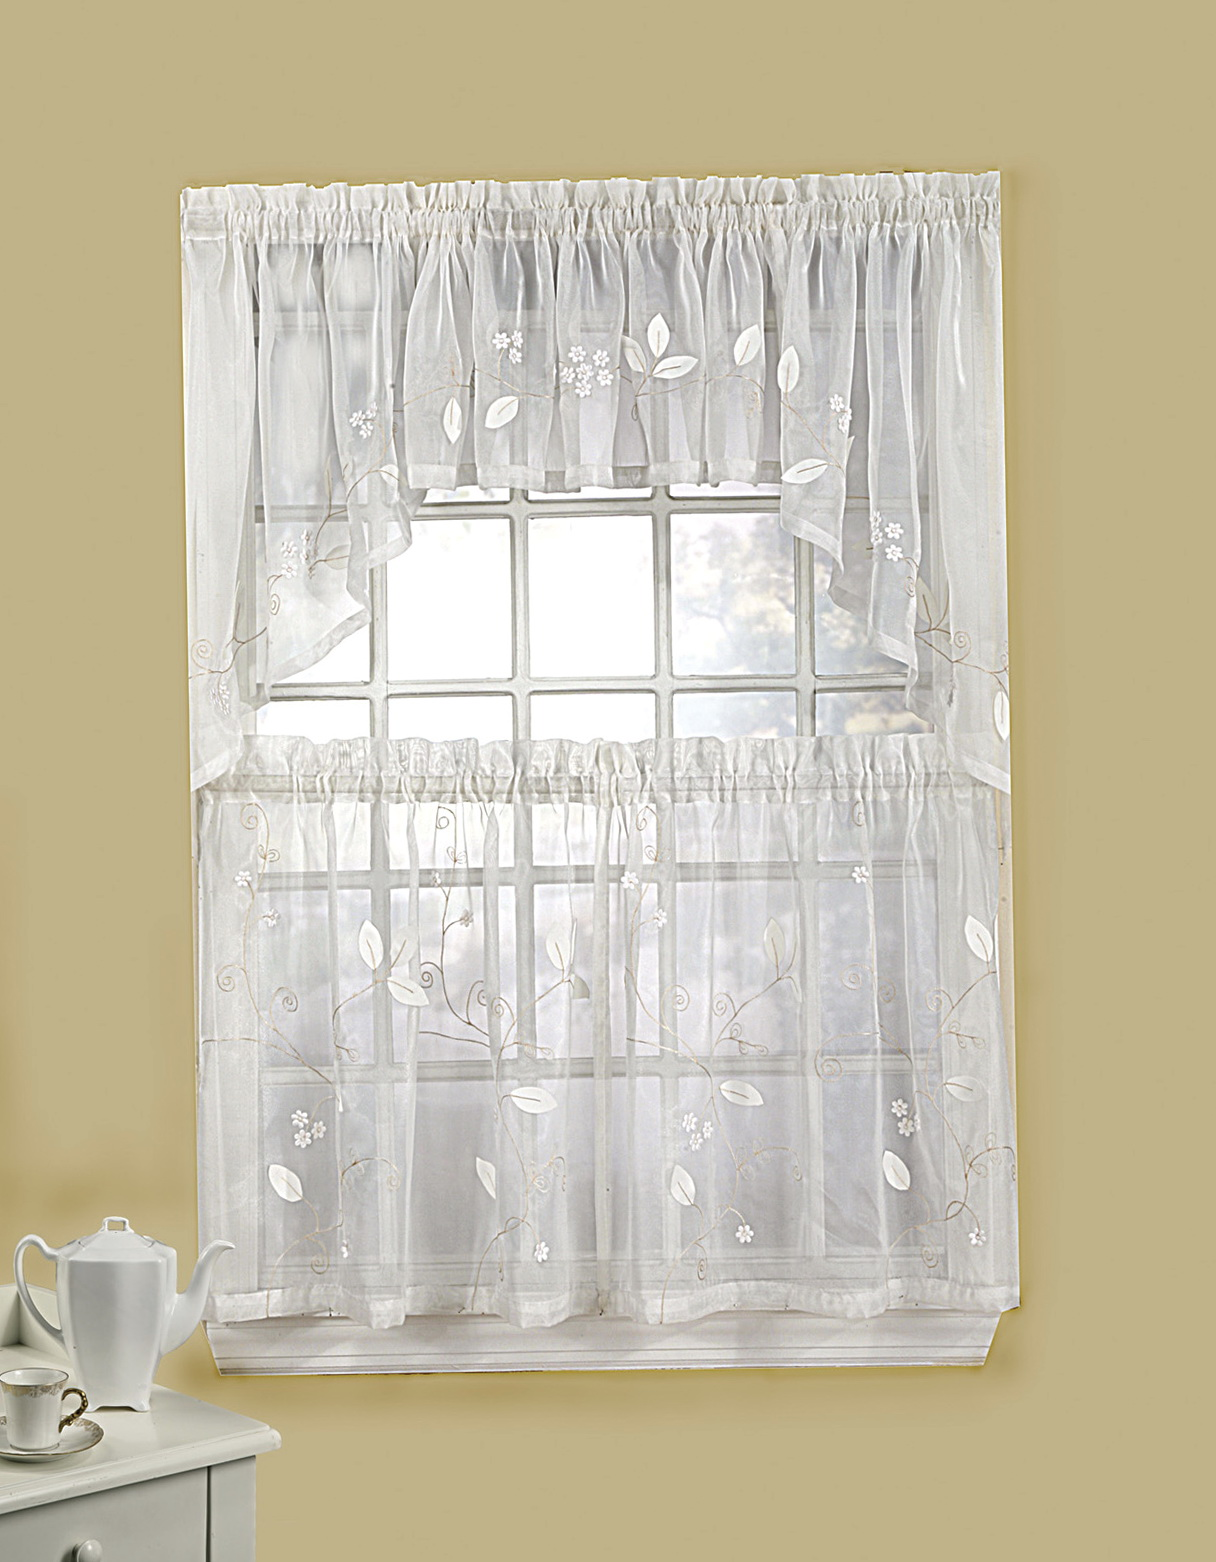 Kitchen Curtain With Valance